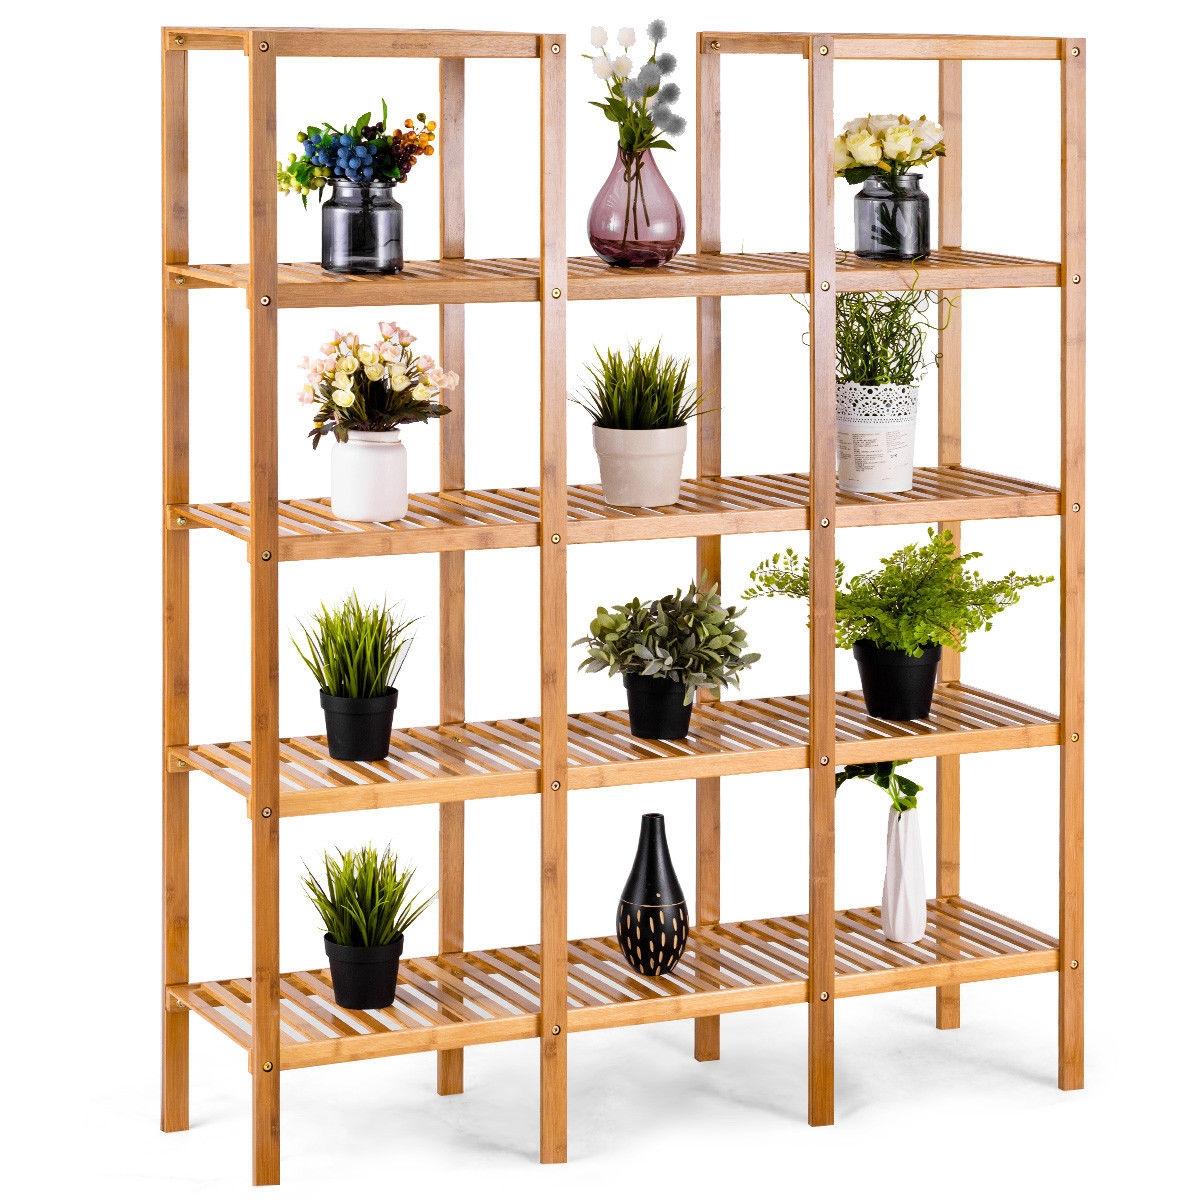 Multifunctional Bamboo Shelf Flower Plant Display Stand